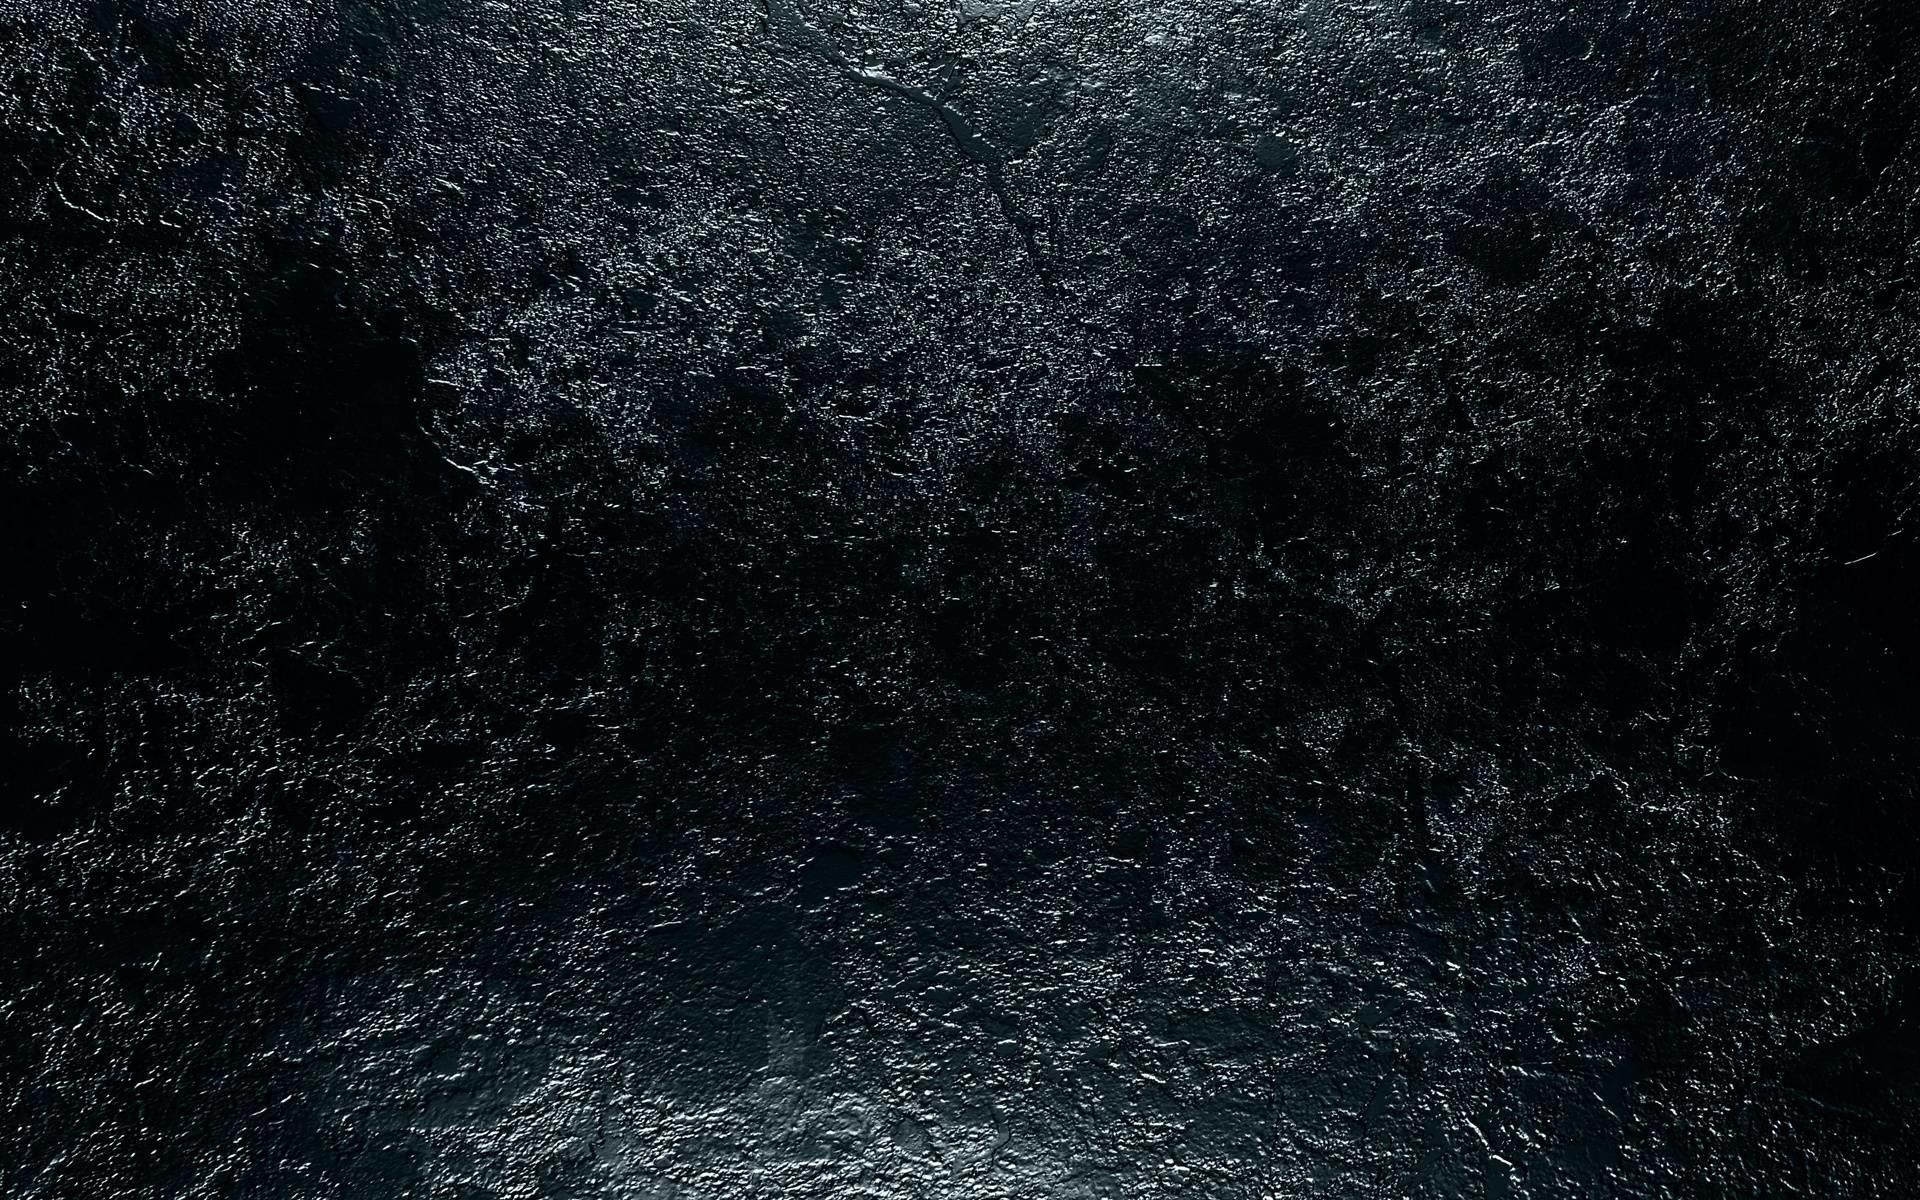 1920x1080 surface  templates  textures  backgrounds  black metal     Wallpapers. Metal Backgrounds HD Wallpaper  63  images